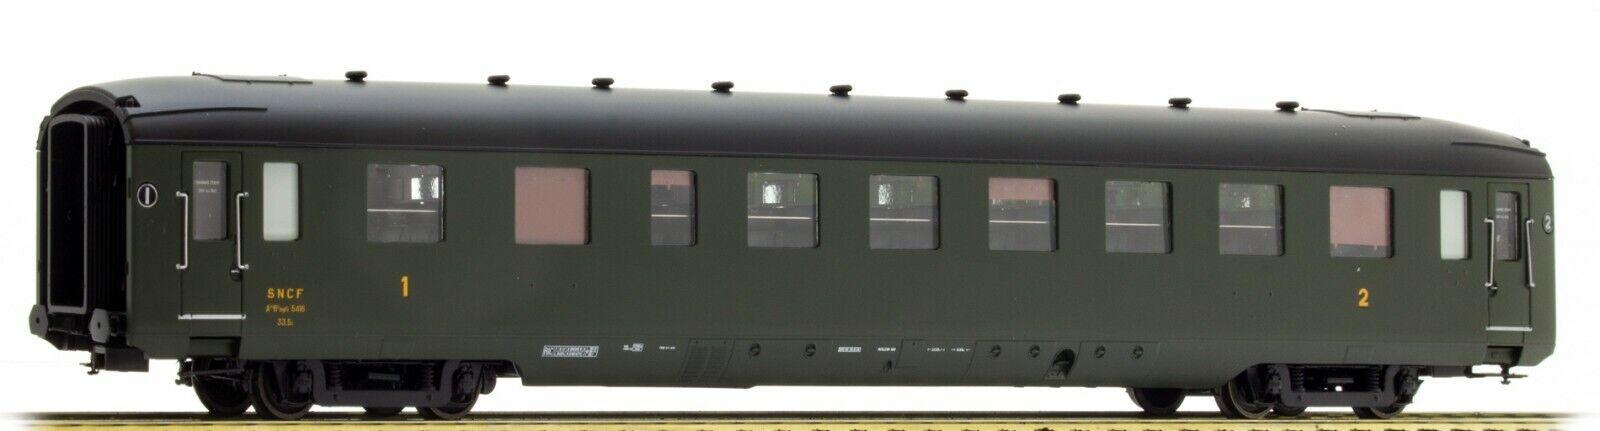 REE Modeles collection VB-196 DEV AO VERSIONE CORTA  1a/2a cl. VERDE SNCF